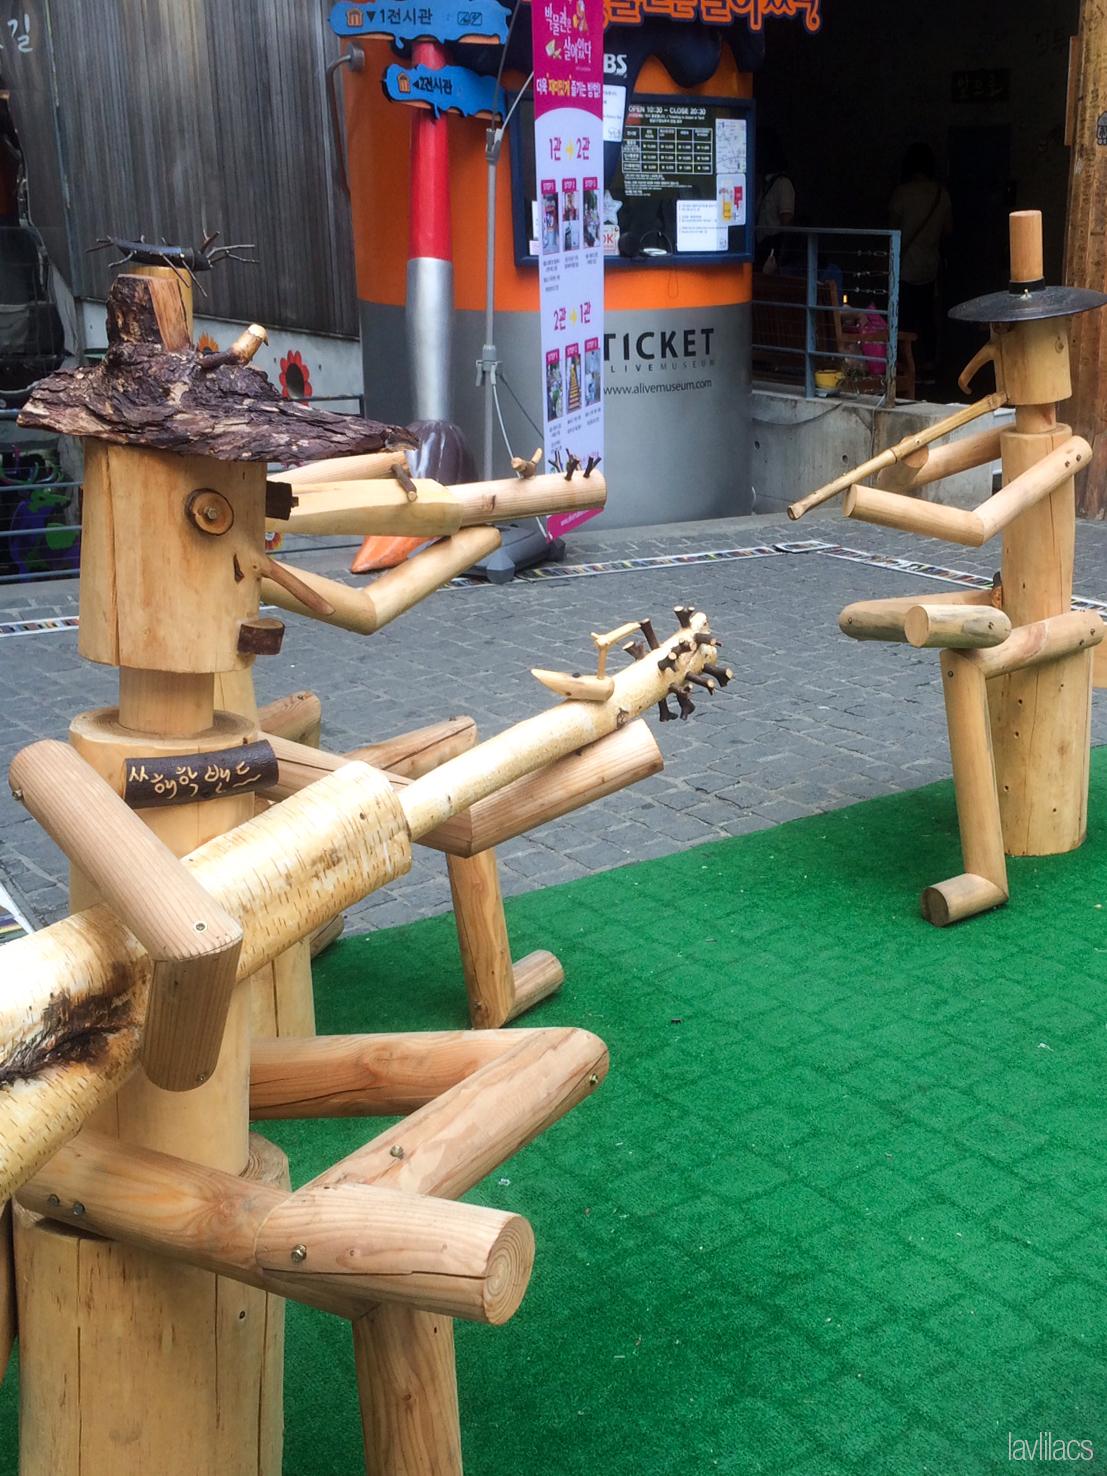 Seoul, Korea - Summer Study Abroad 2014 - Seoul City Touring - Insadong 인사동 仁寺洞 - Ssamziegil 쌈지길 art wood sculptures